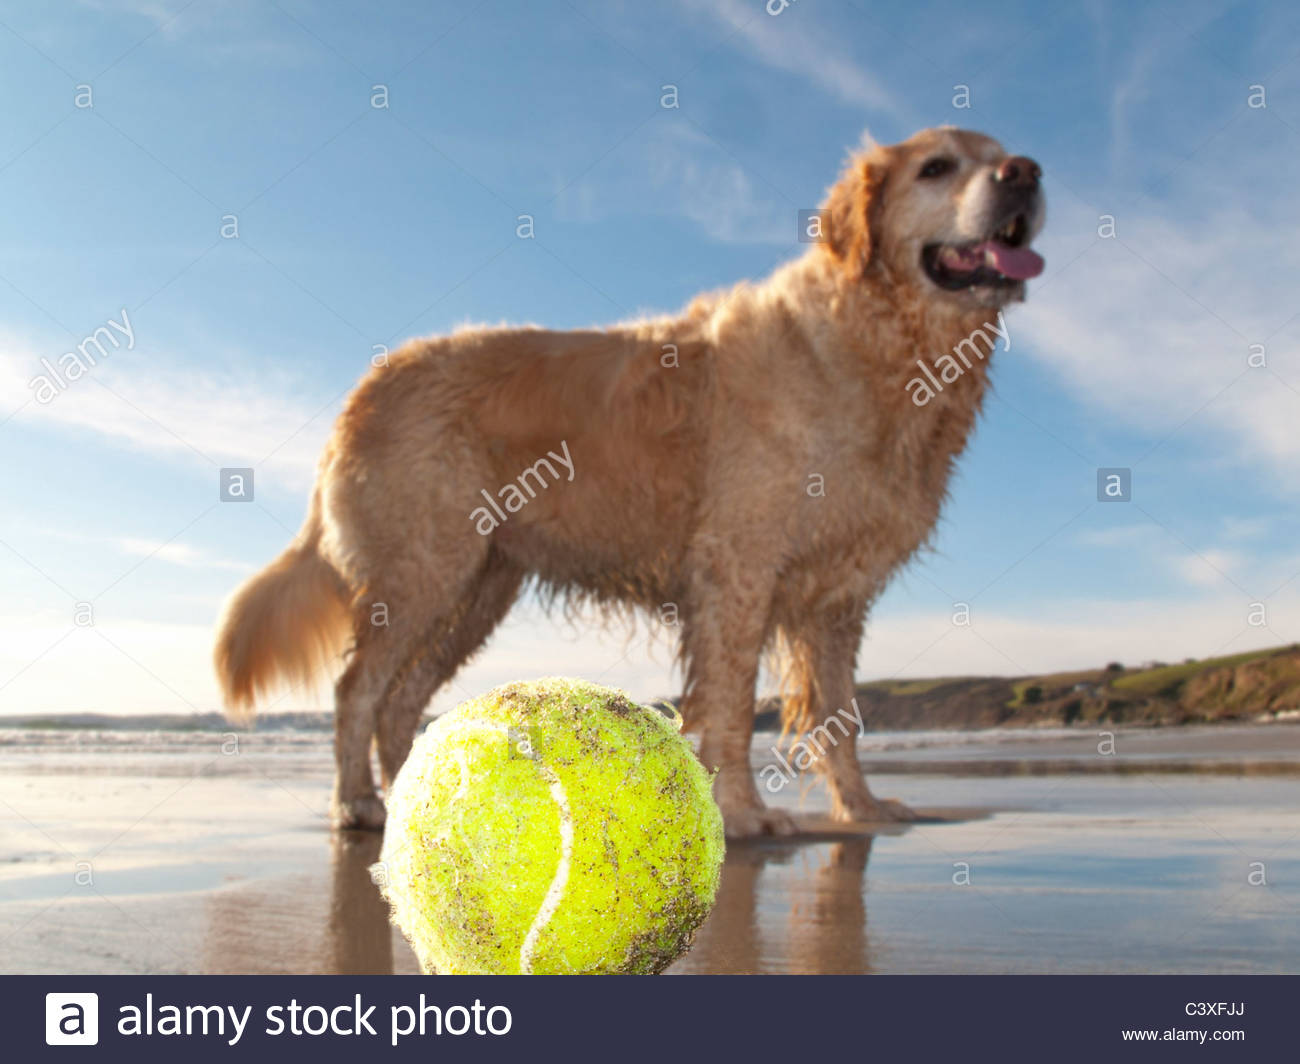 Dog enjoying beach and tennis ball at Gerrans Bay, Cornwall, United Kingdom Stock Photo